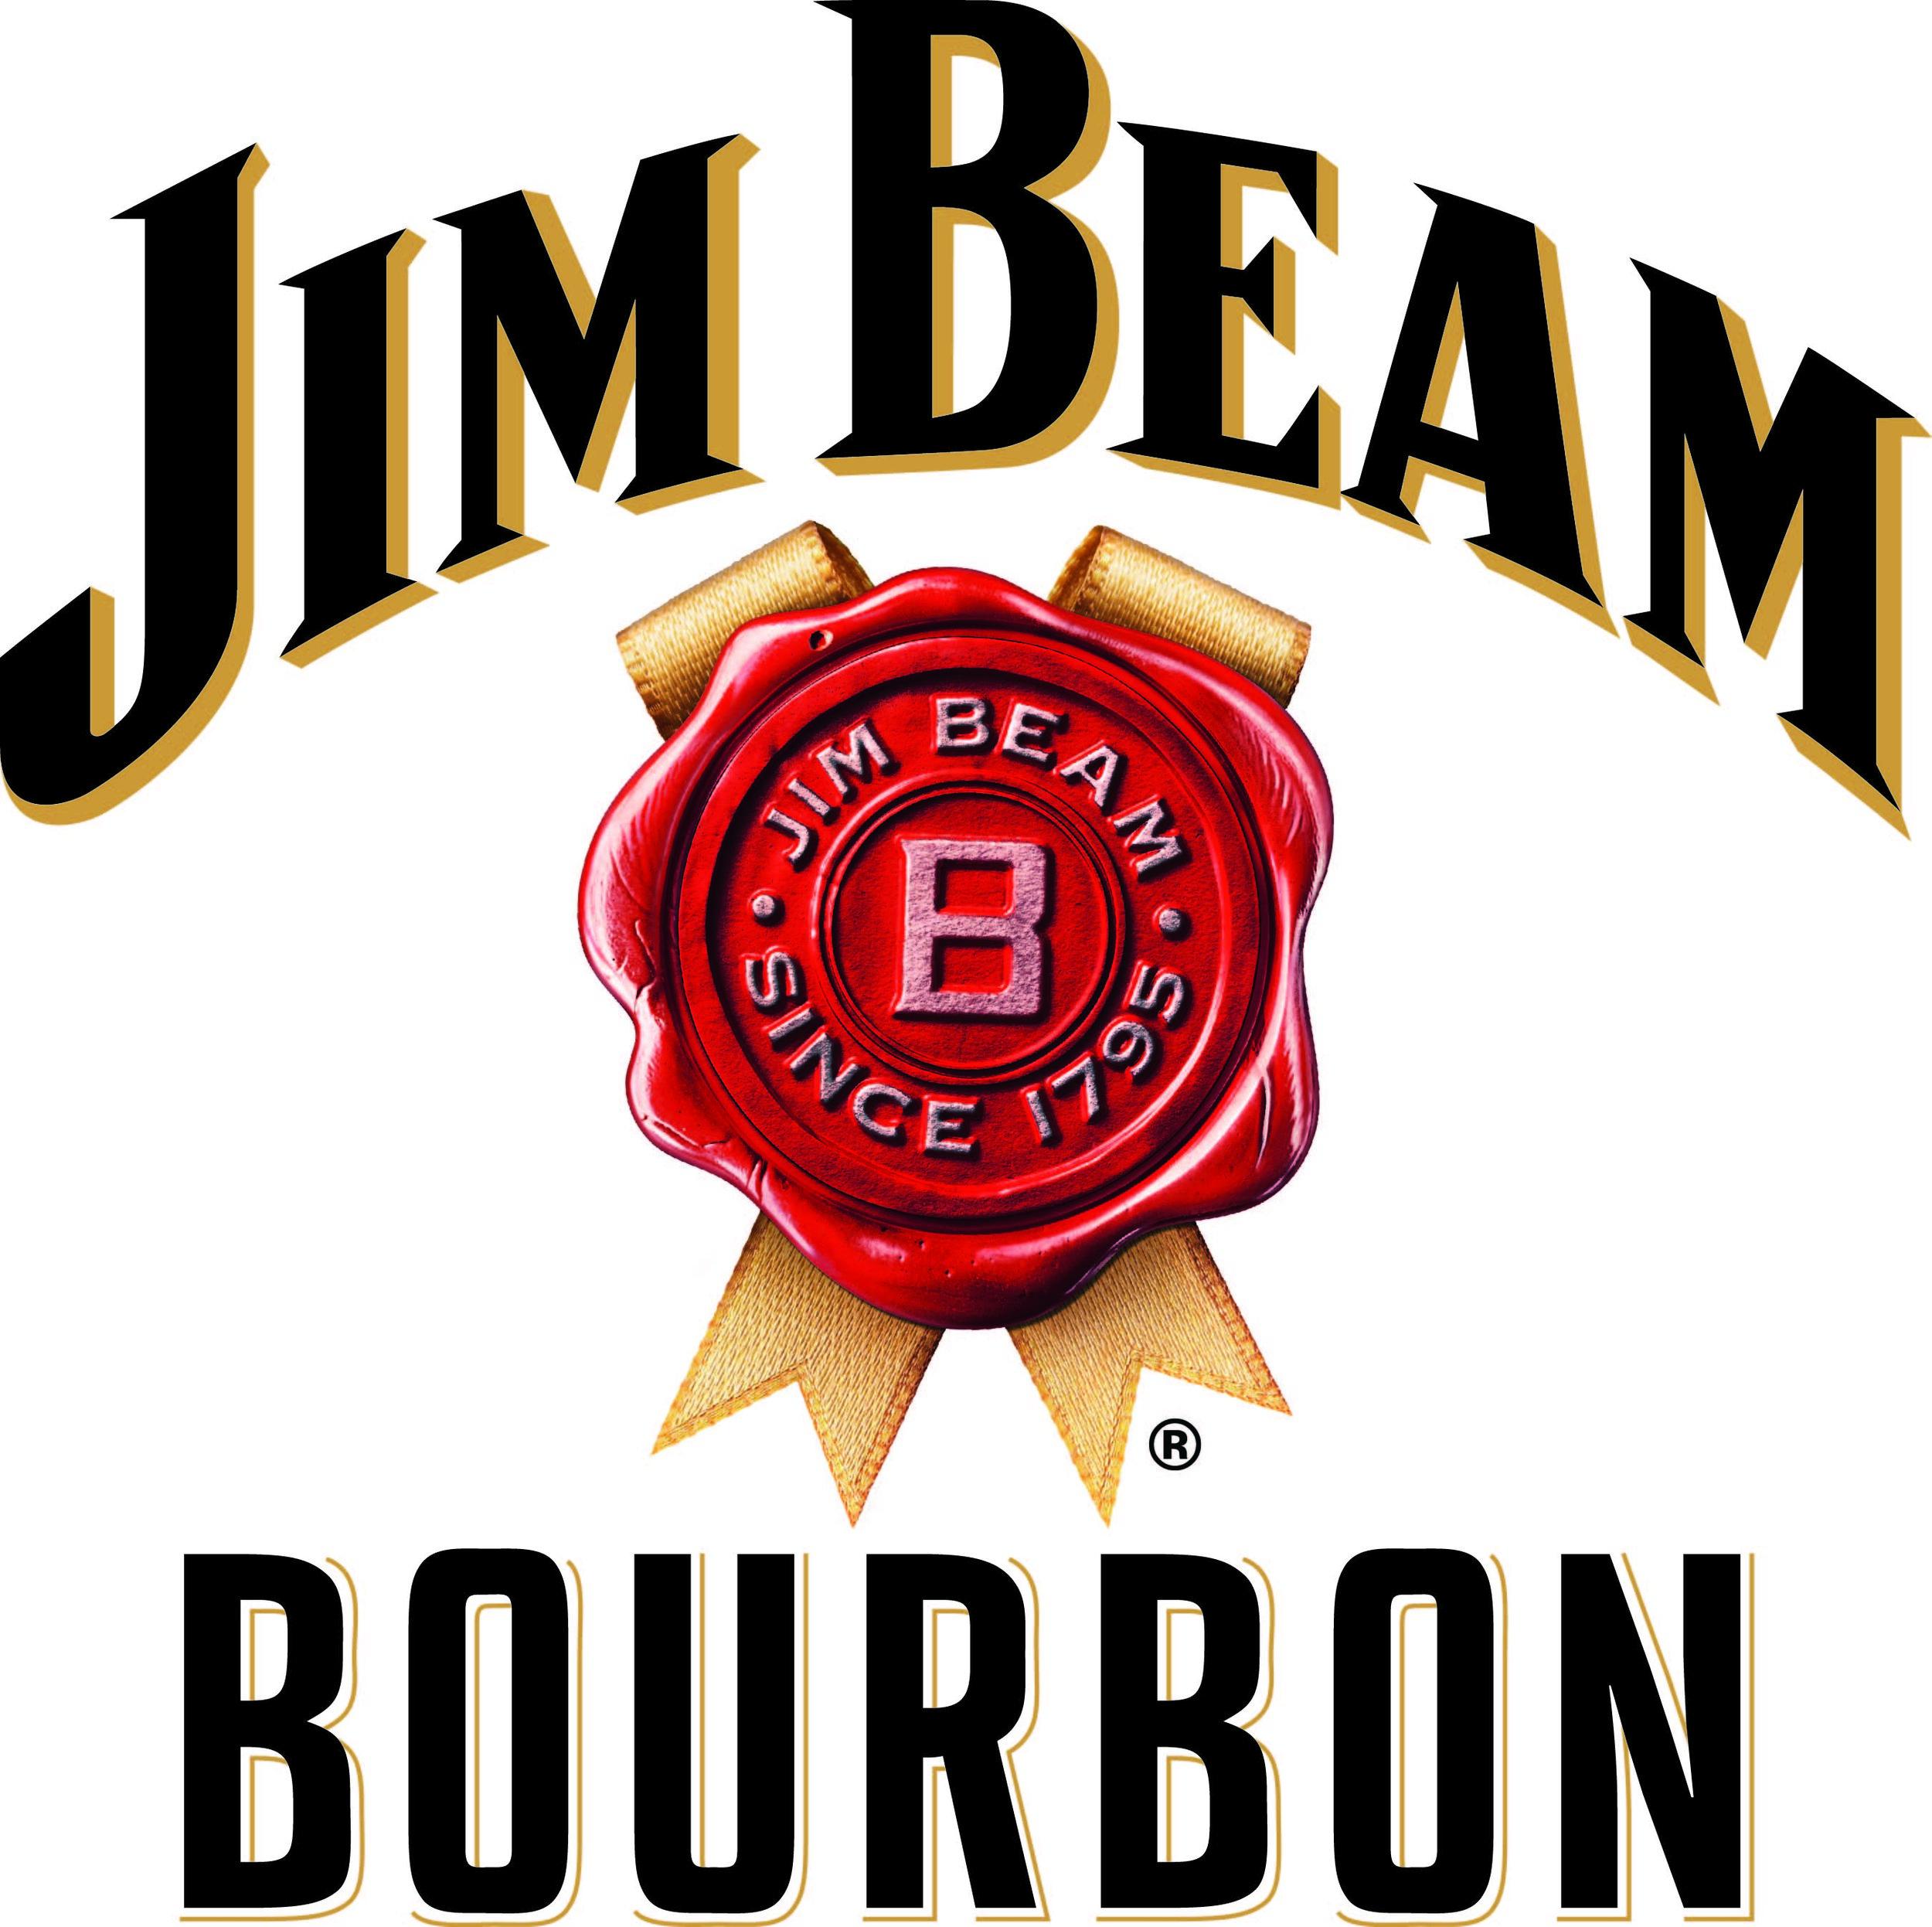 JB_Bourbon.jpg